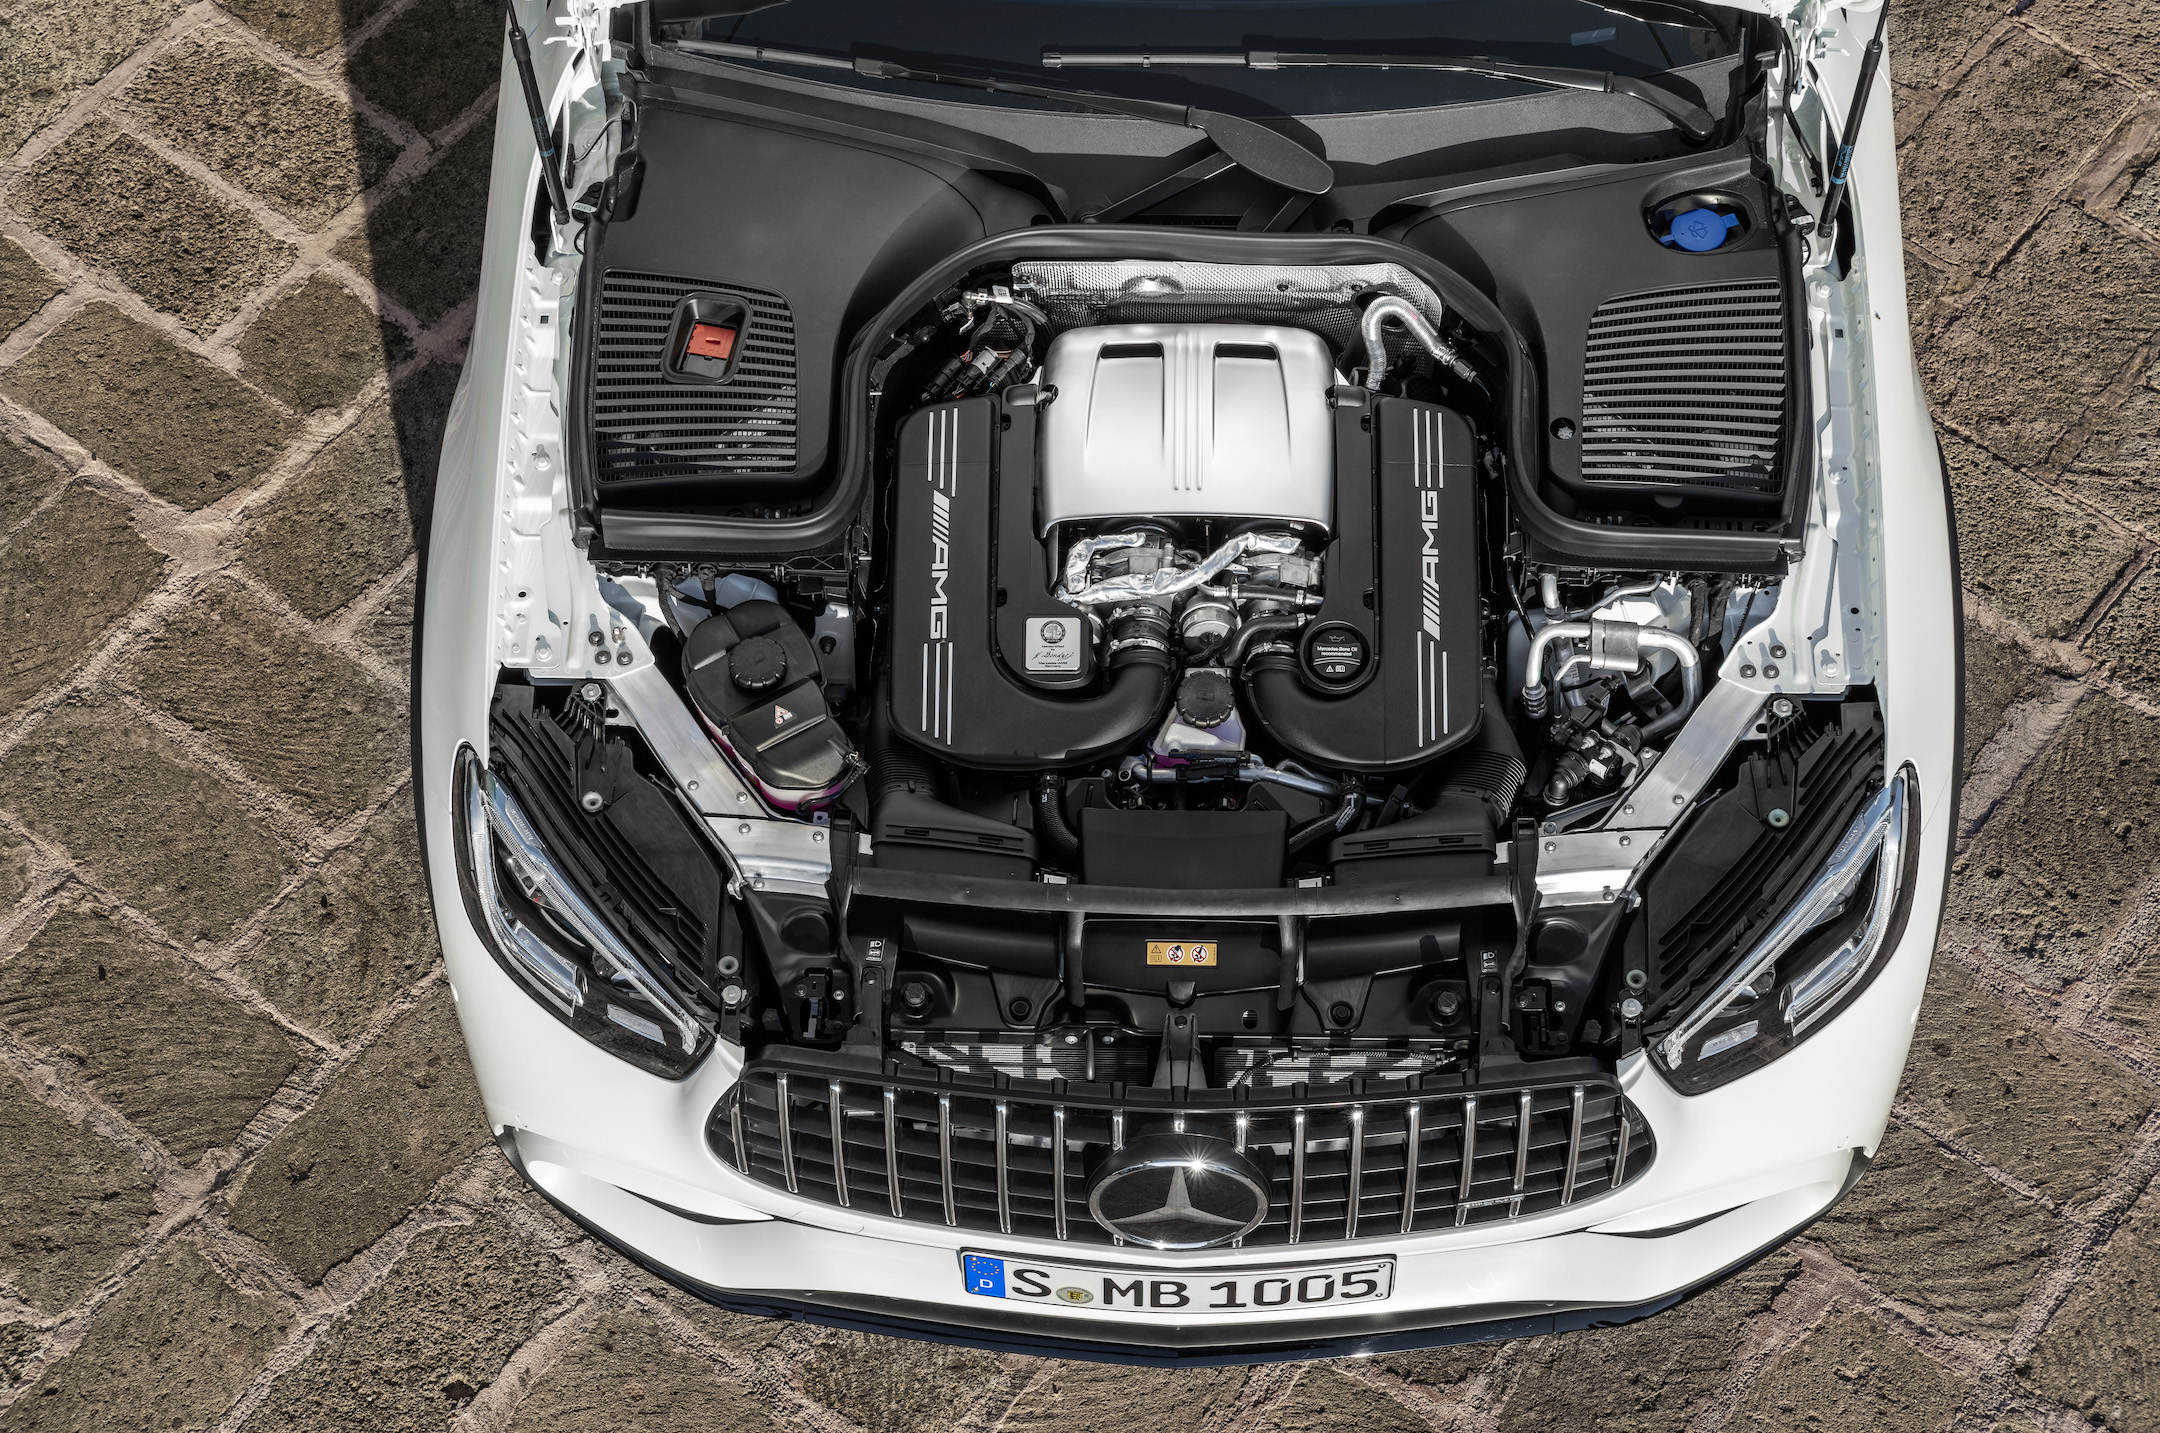 Mercedes-AMG GLC 63 S 4MATIC+  (2019)